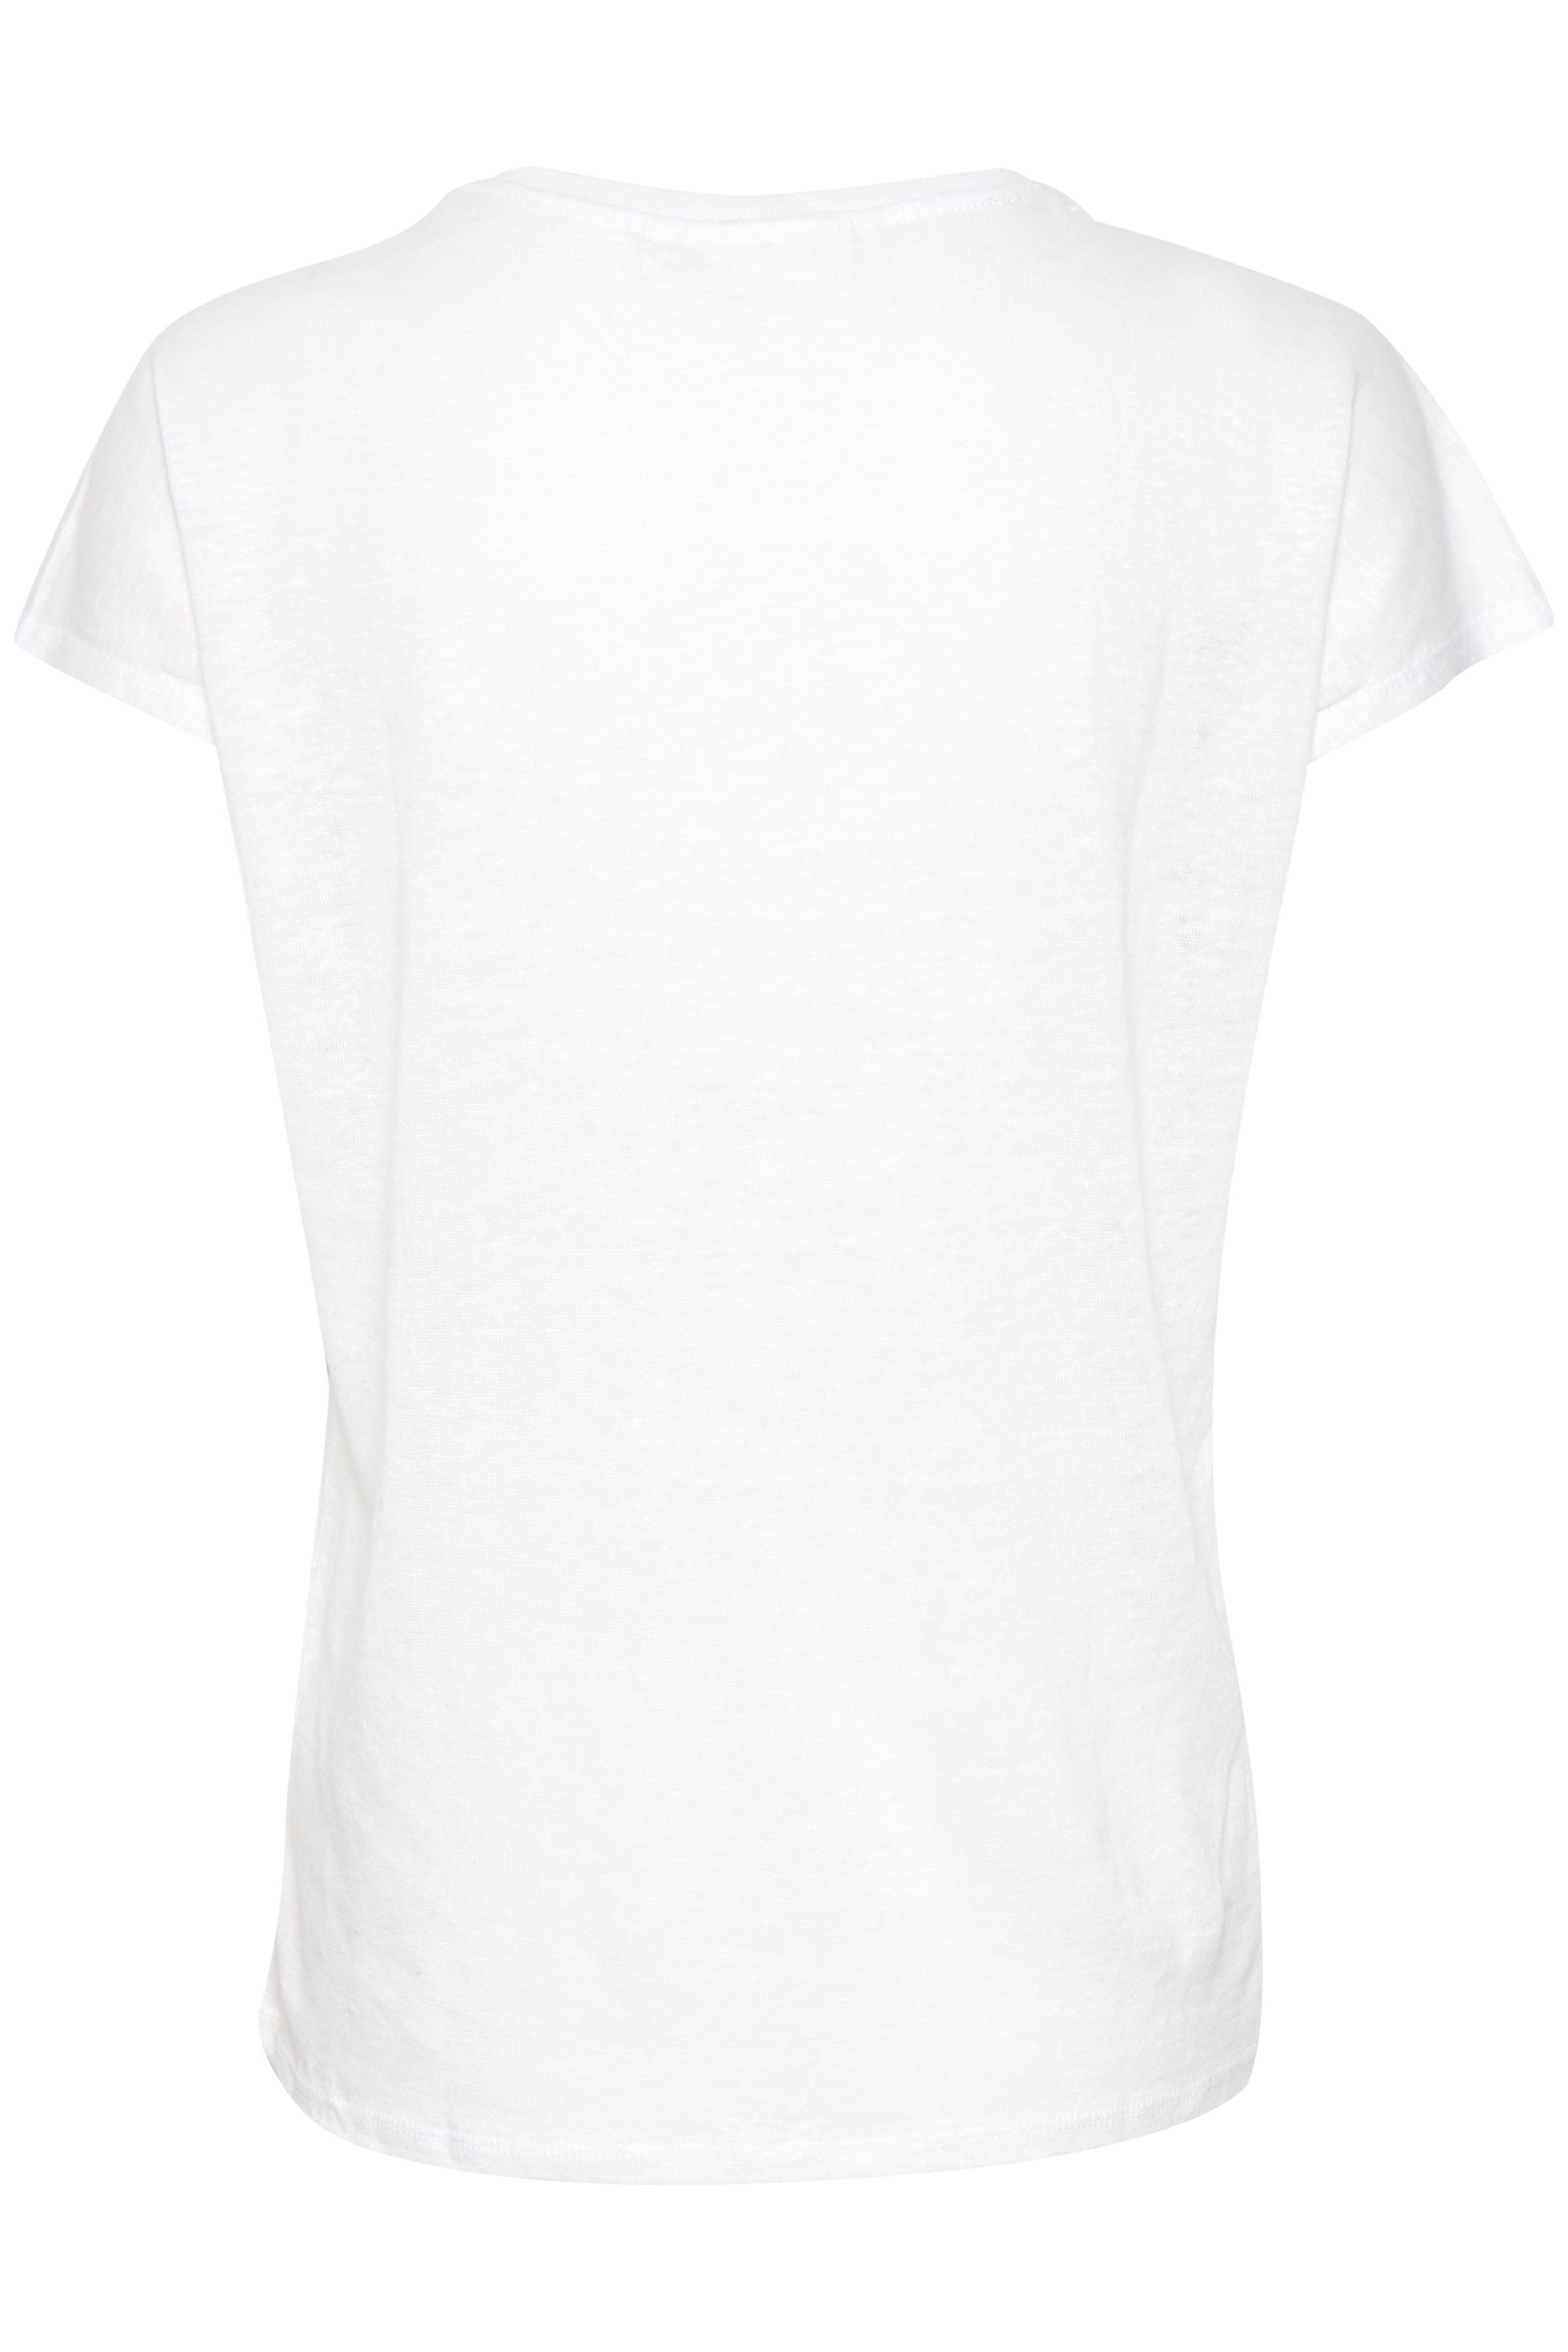 Pure White T-Shirt – Køb Pure White T-Shirt fra str. S-L her